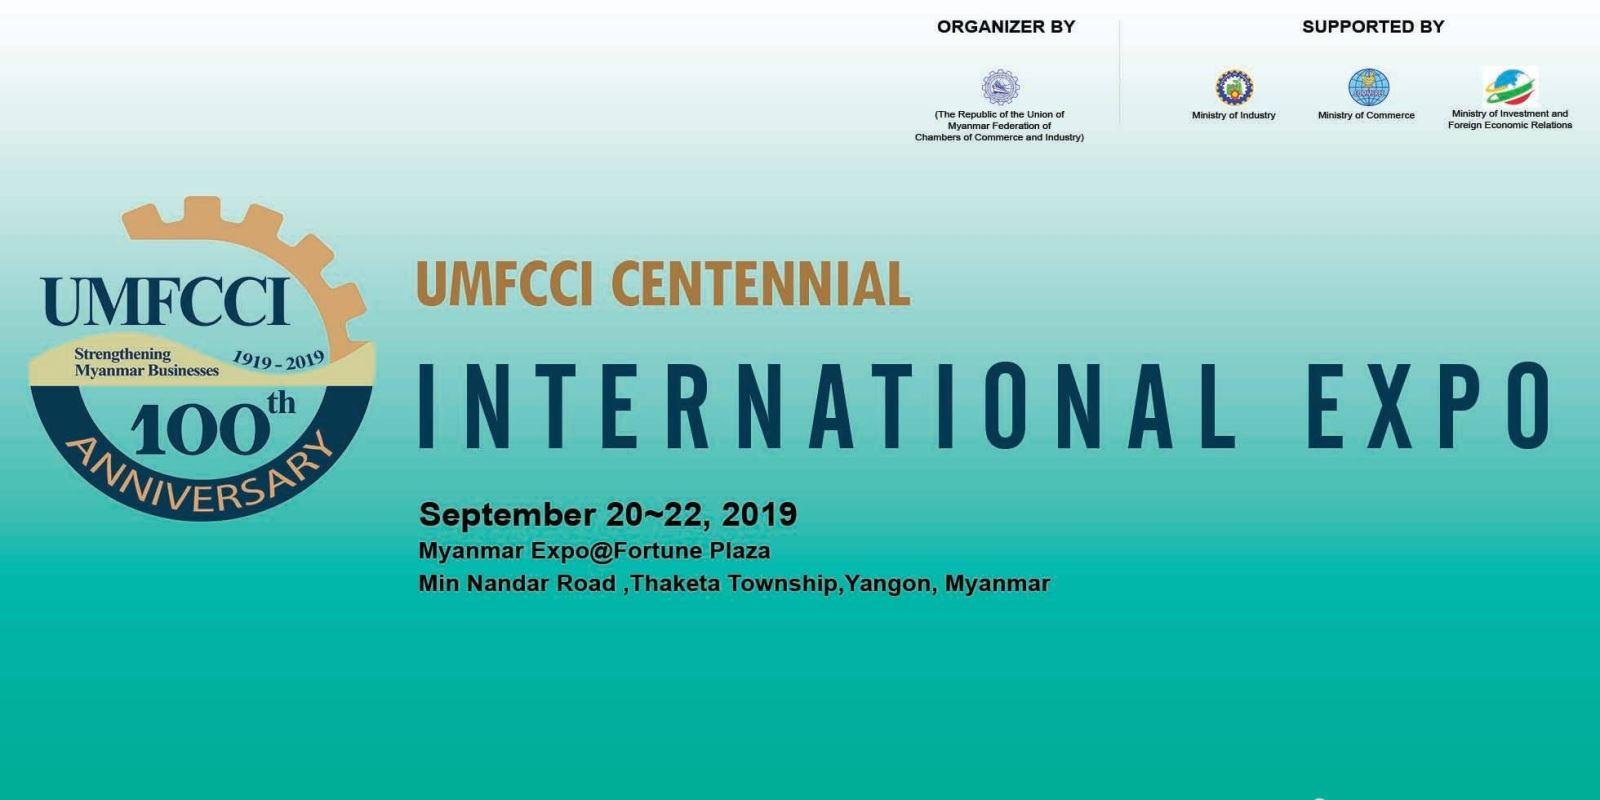 UMFCCI Centennial International Expo